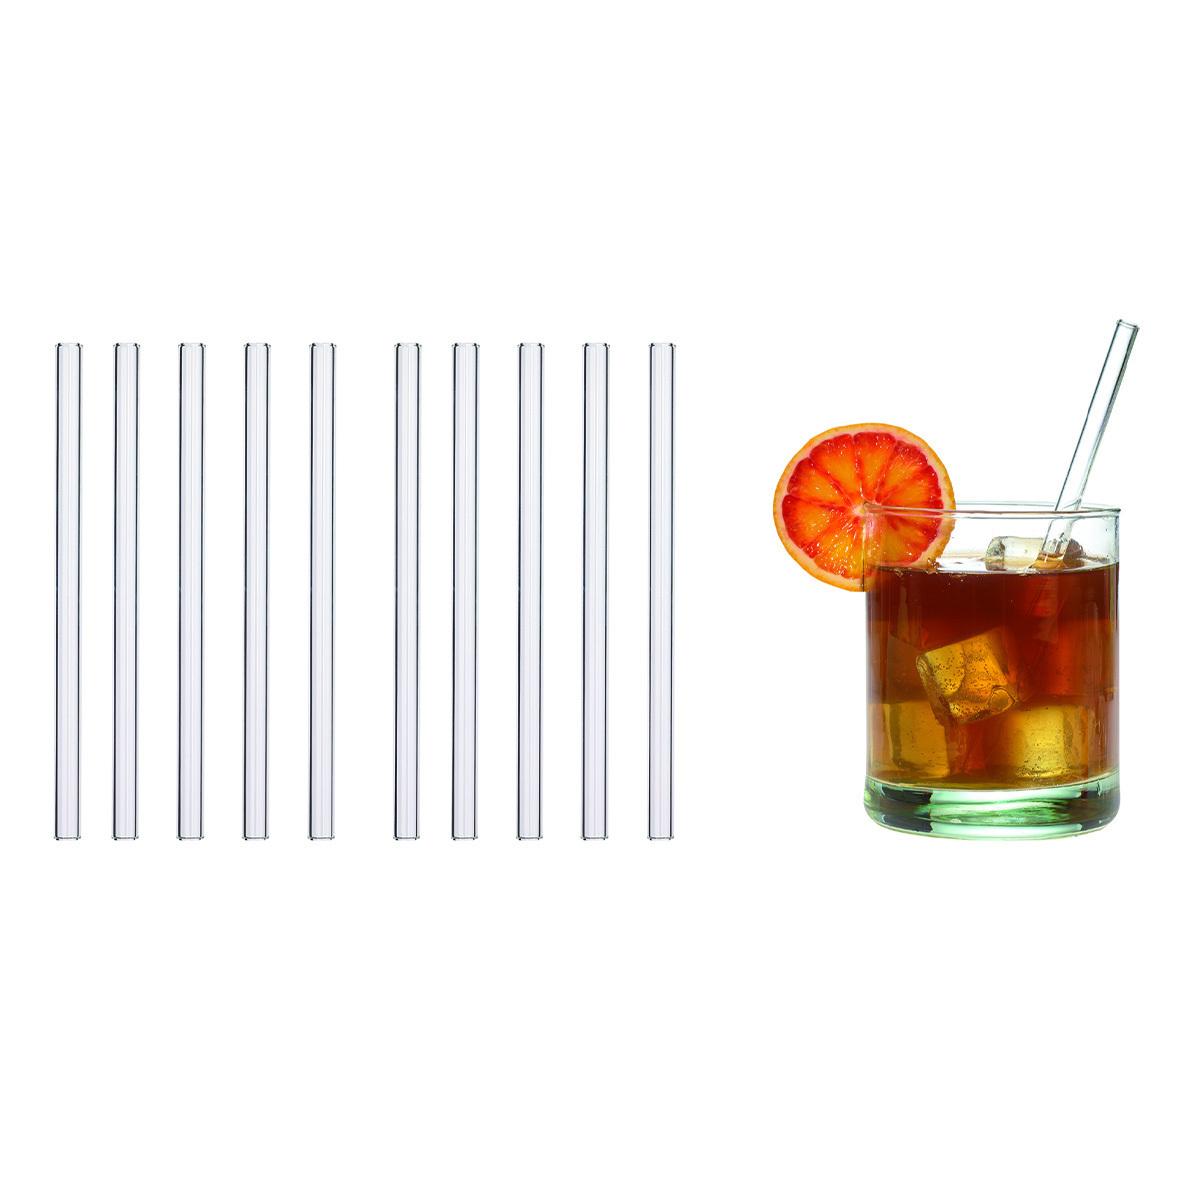 14-2015-10-trinkhalme-glas-glaswerk-short-set-1200x1200px.jpg